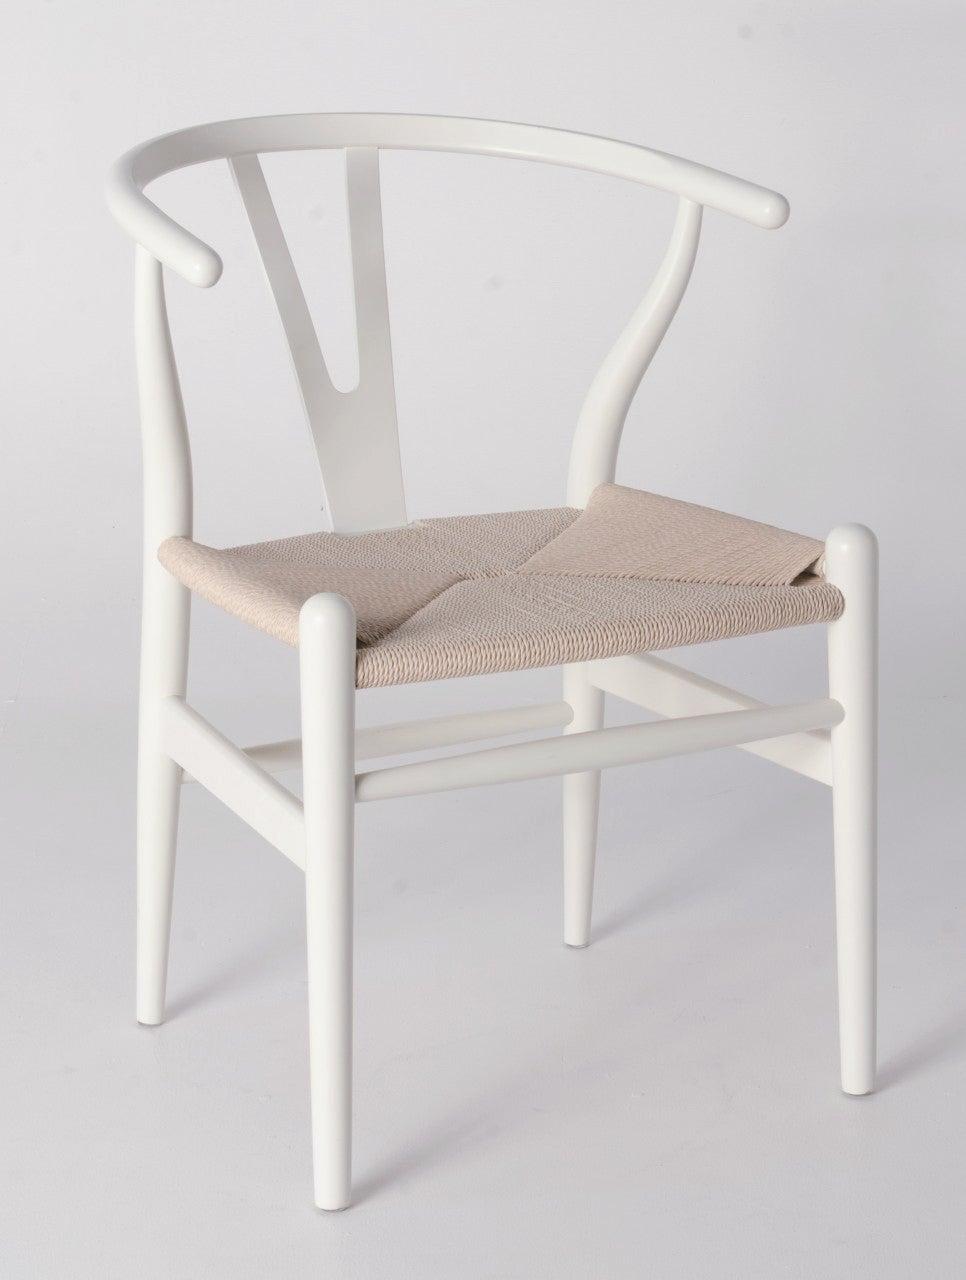 Replica Hans Wegner Wishbone Chair - White Frame (grain visible) Natural seat - Ash Timber